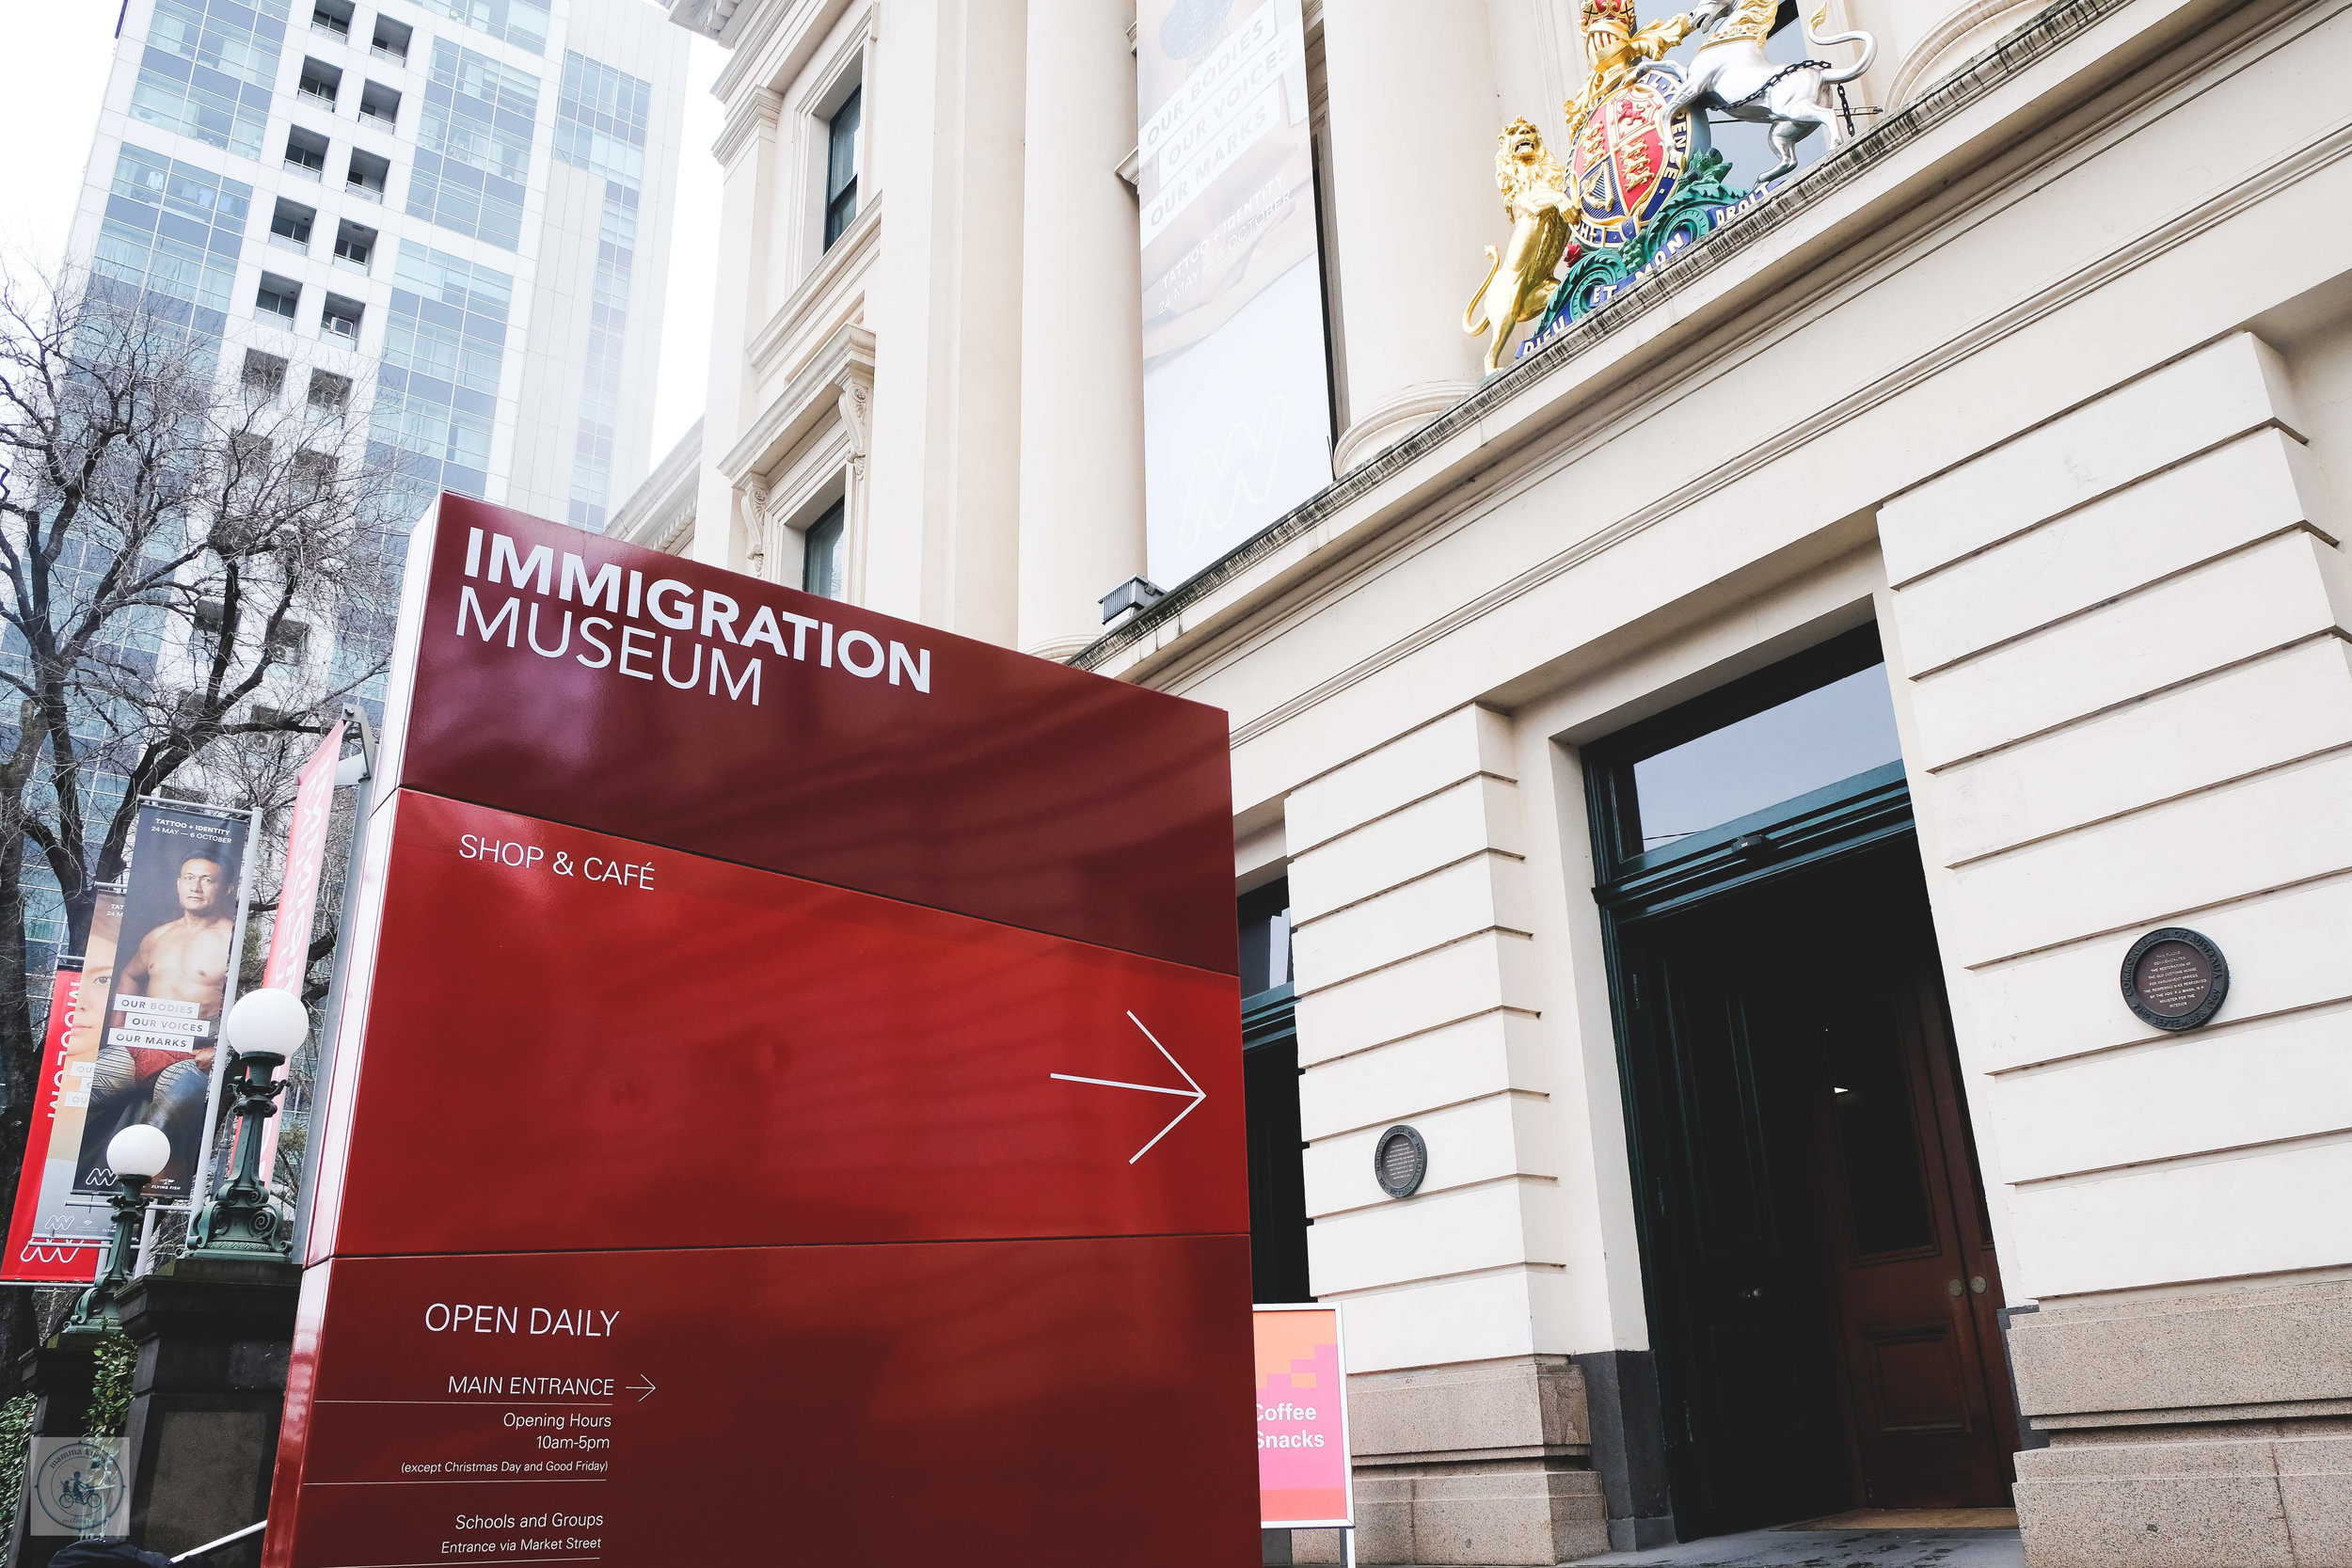 immigration museum, melbourne - mamma knows melbourne